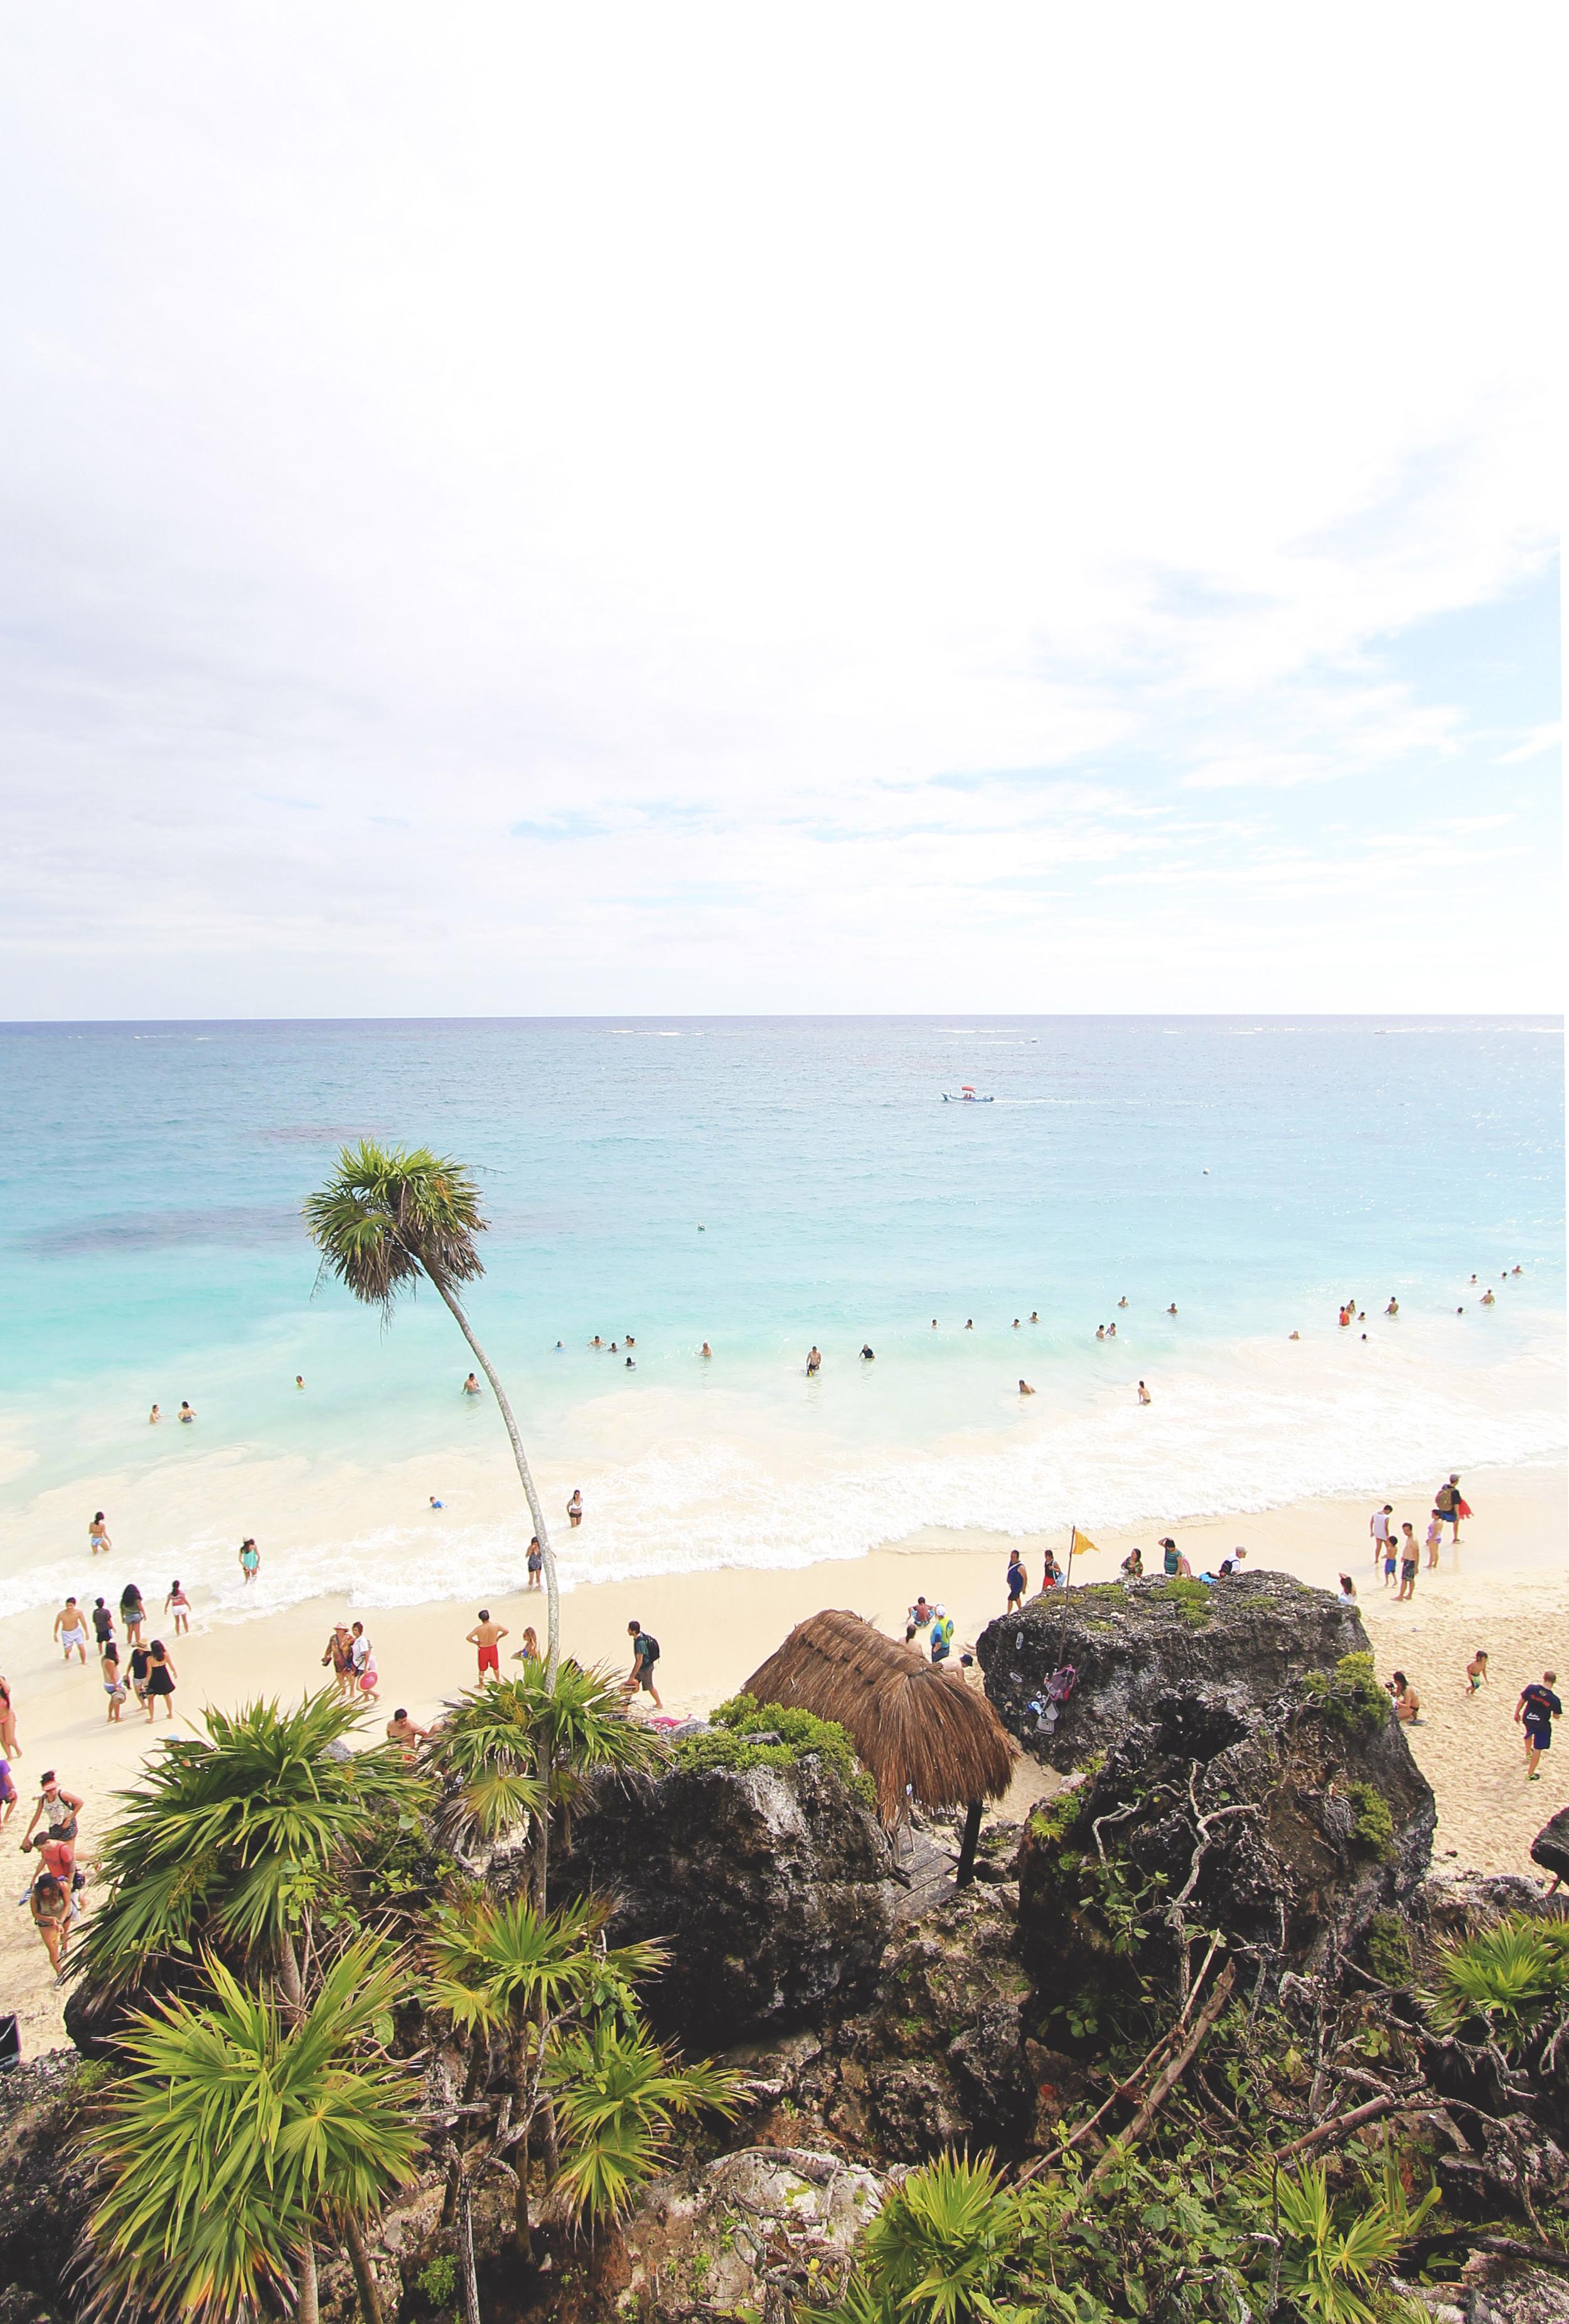 tulum sand beach ocean blue palm trees